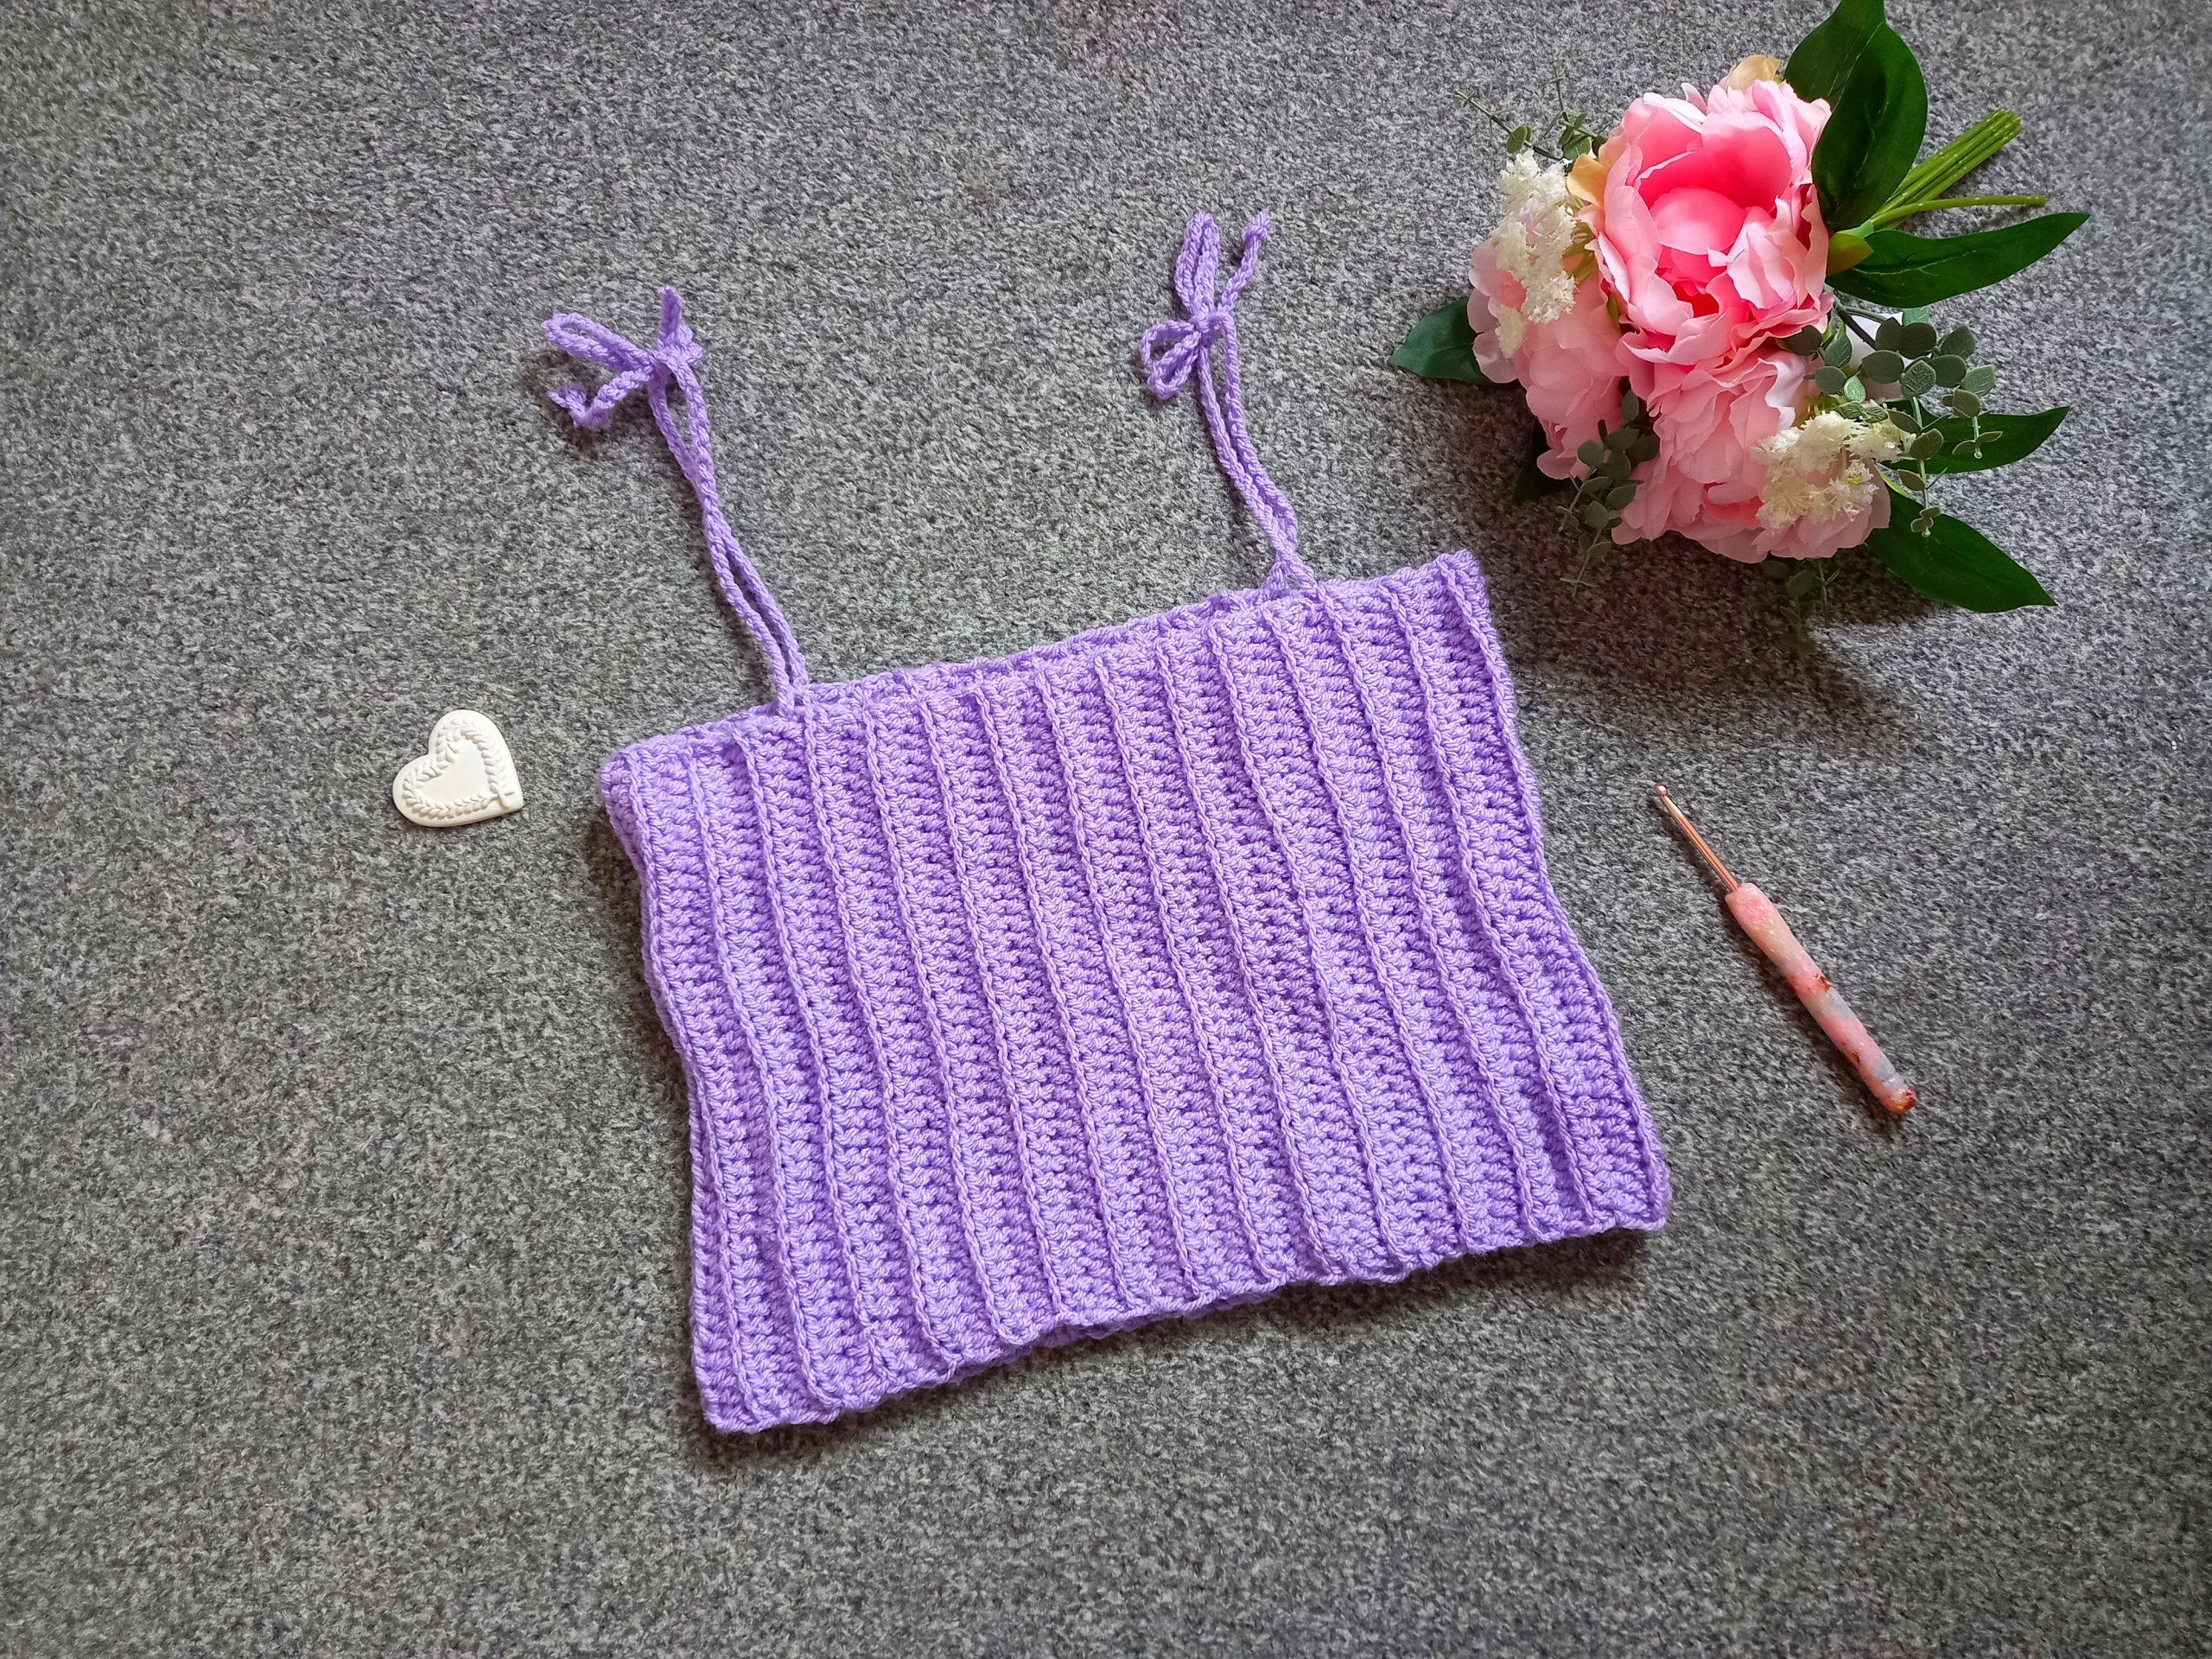 Crochet The Lilac Summer Top